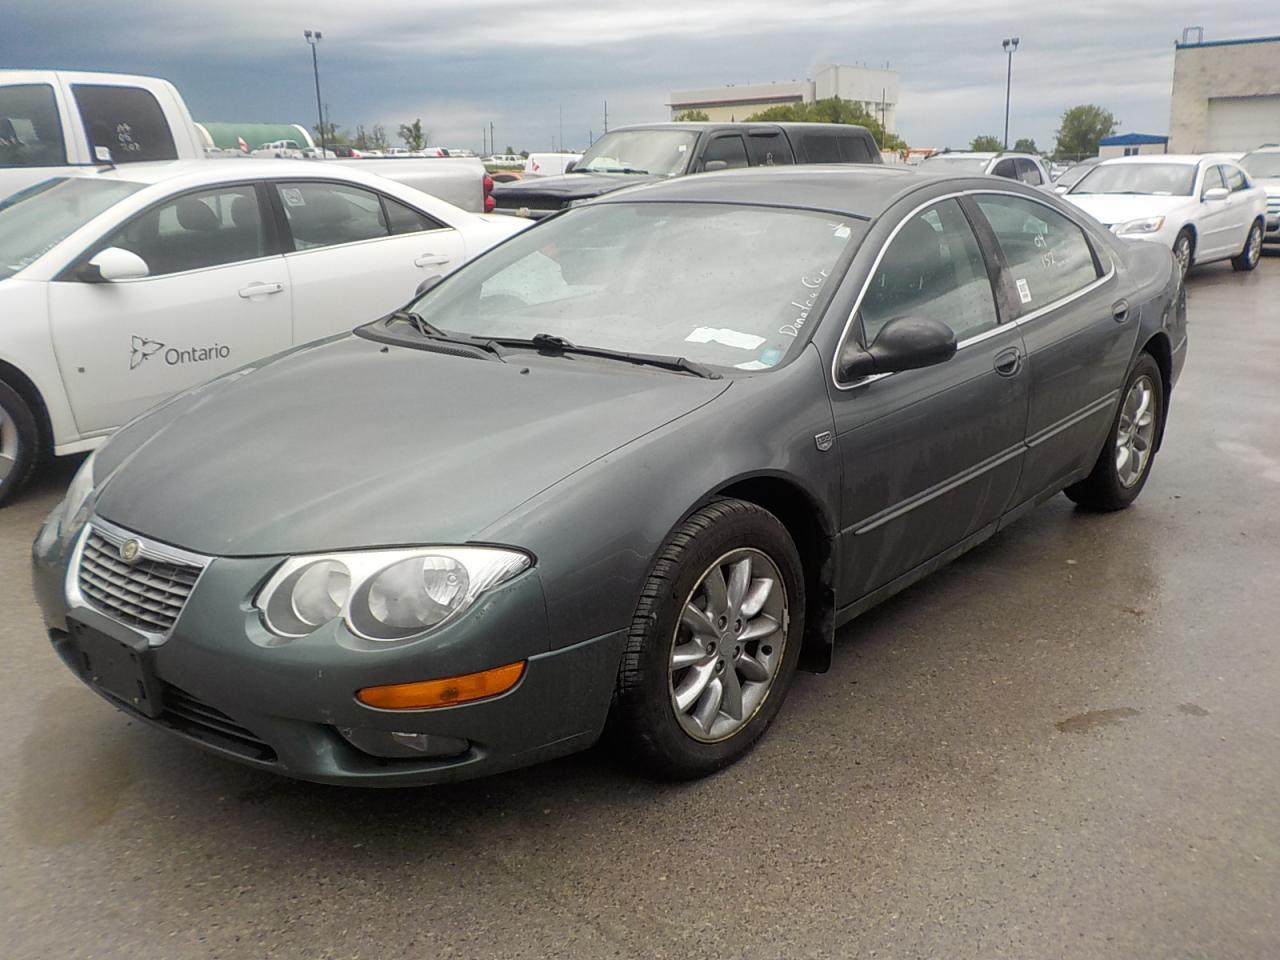 Photo of Grey 2004 Chrysler 300M